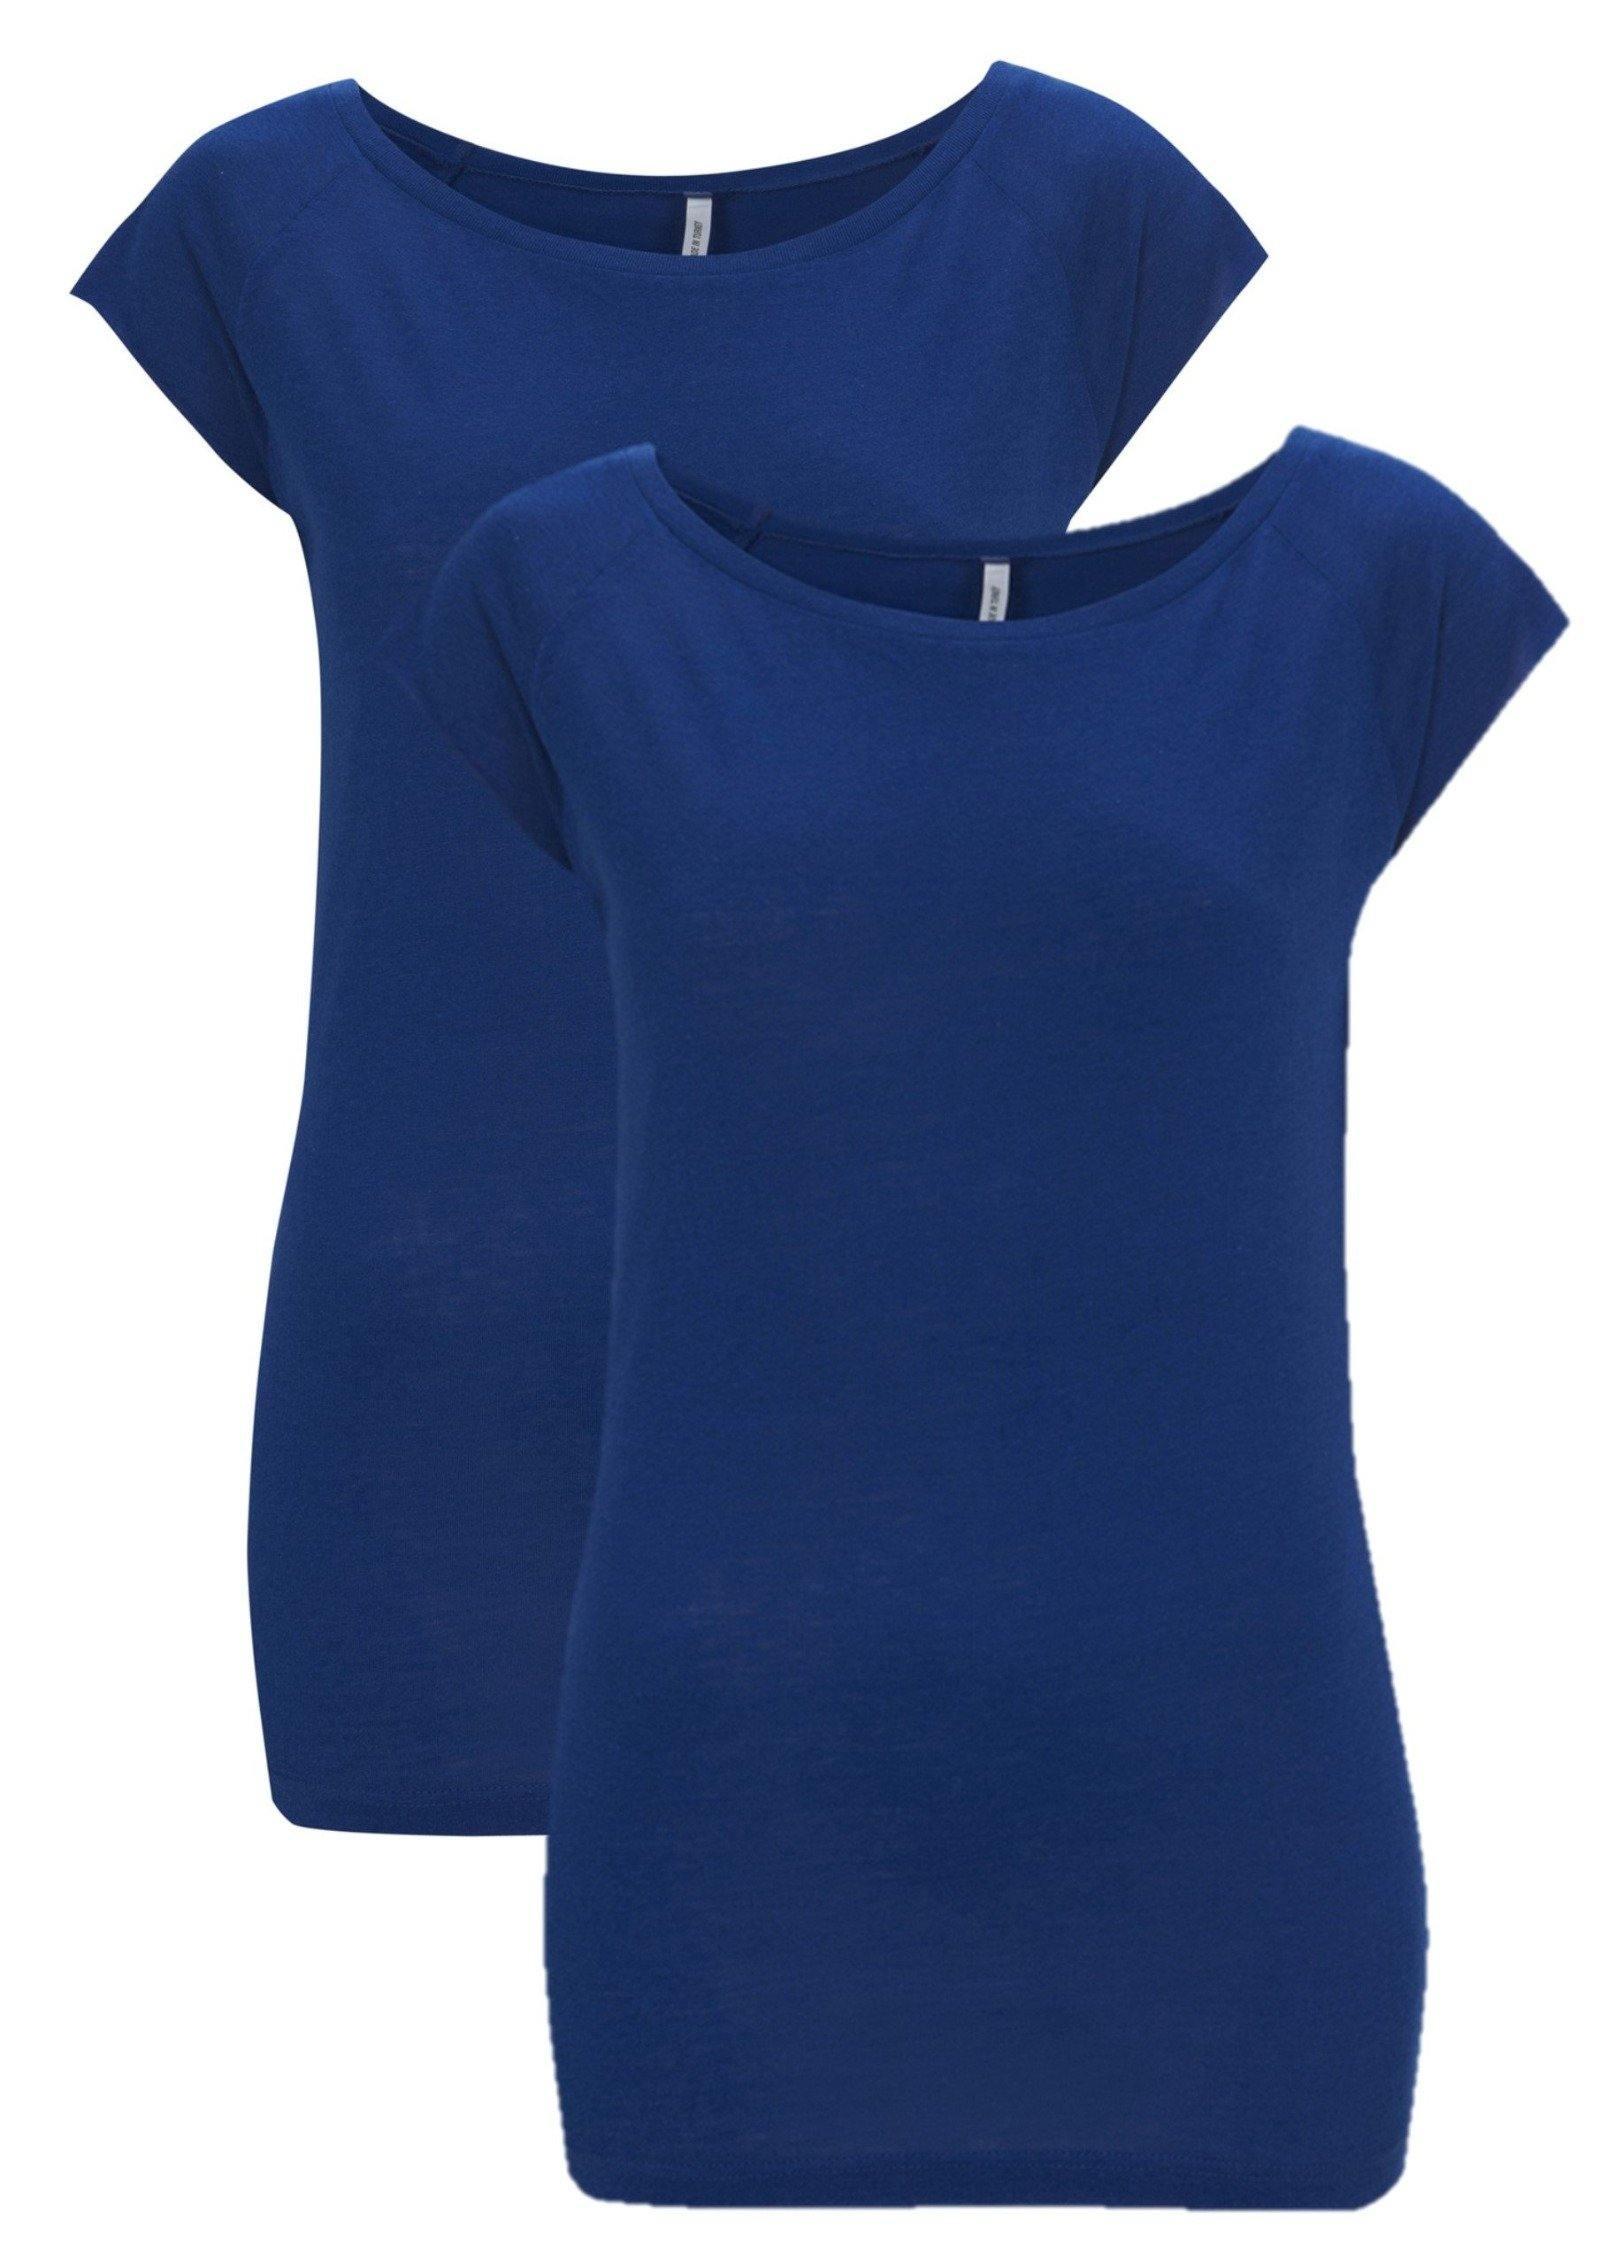 Bamboe t-shirt dames 2-pack blauw | Cayboo